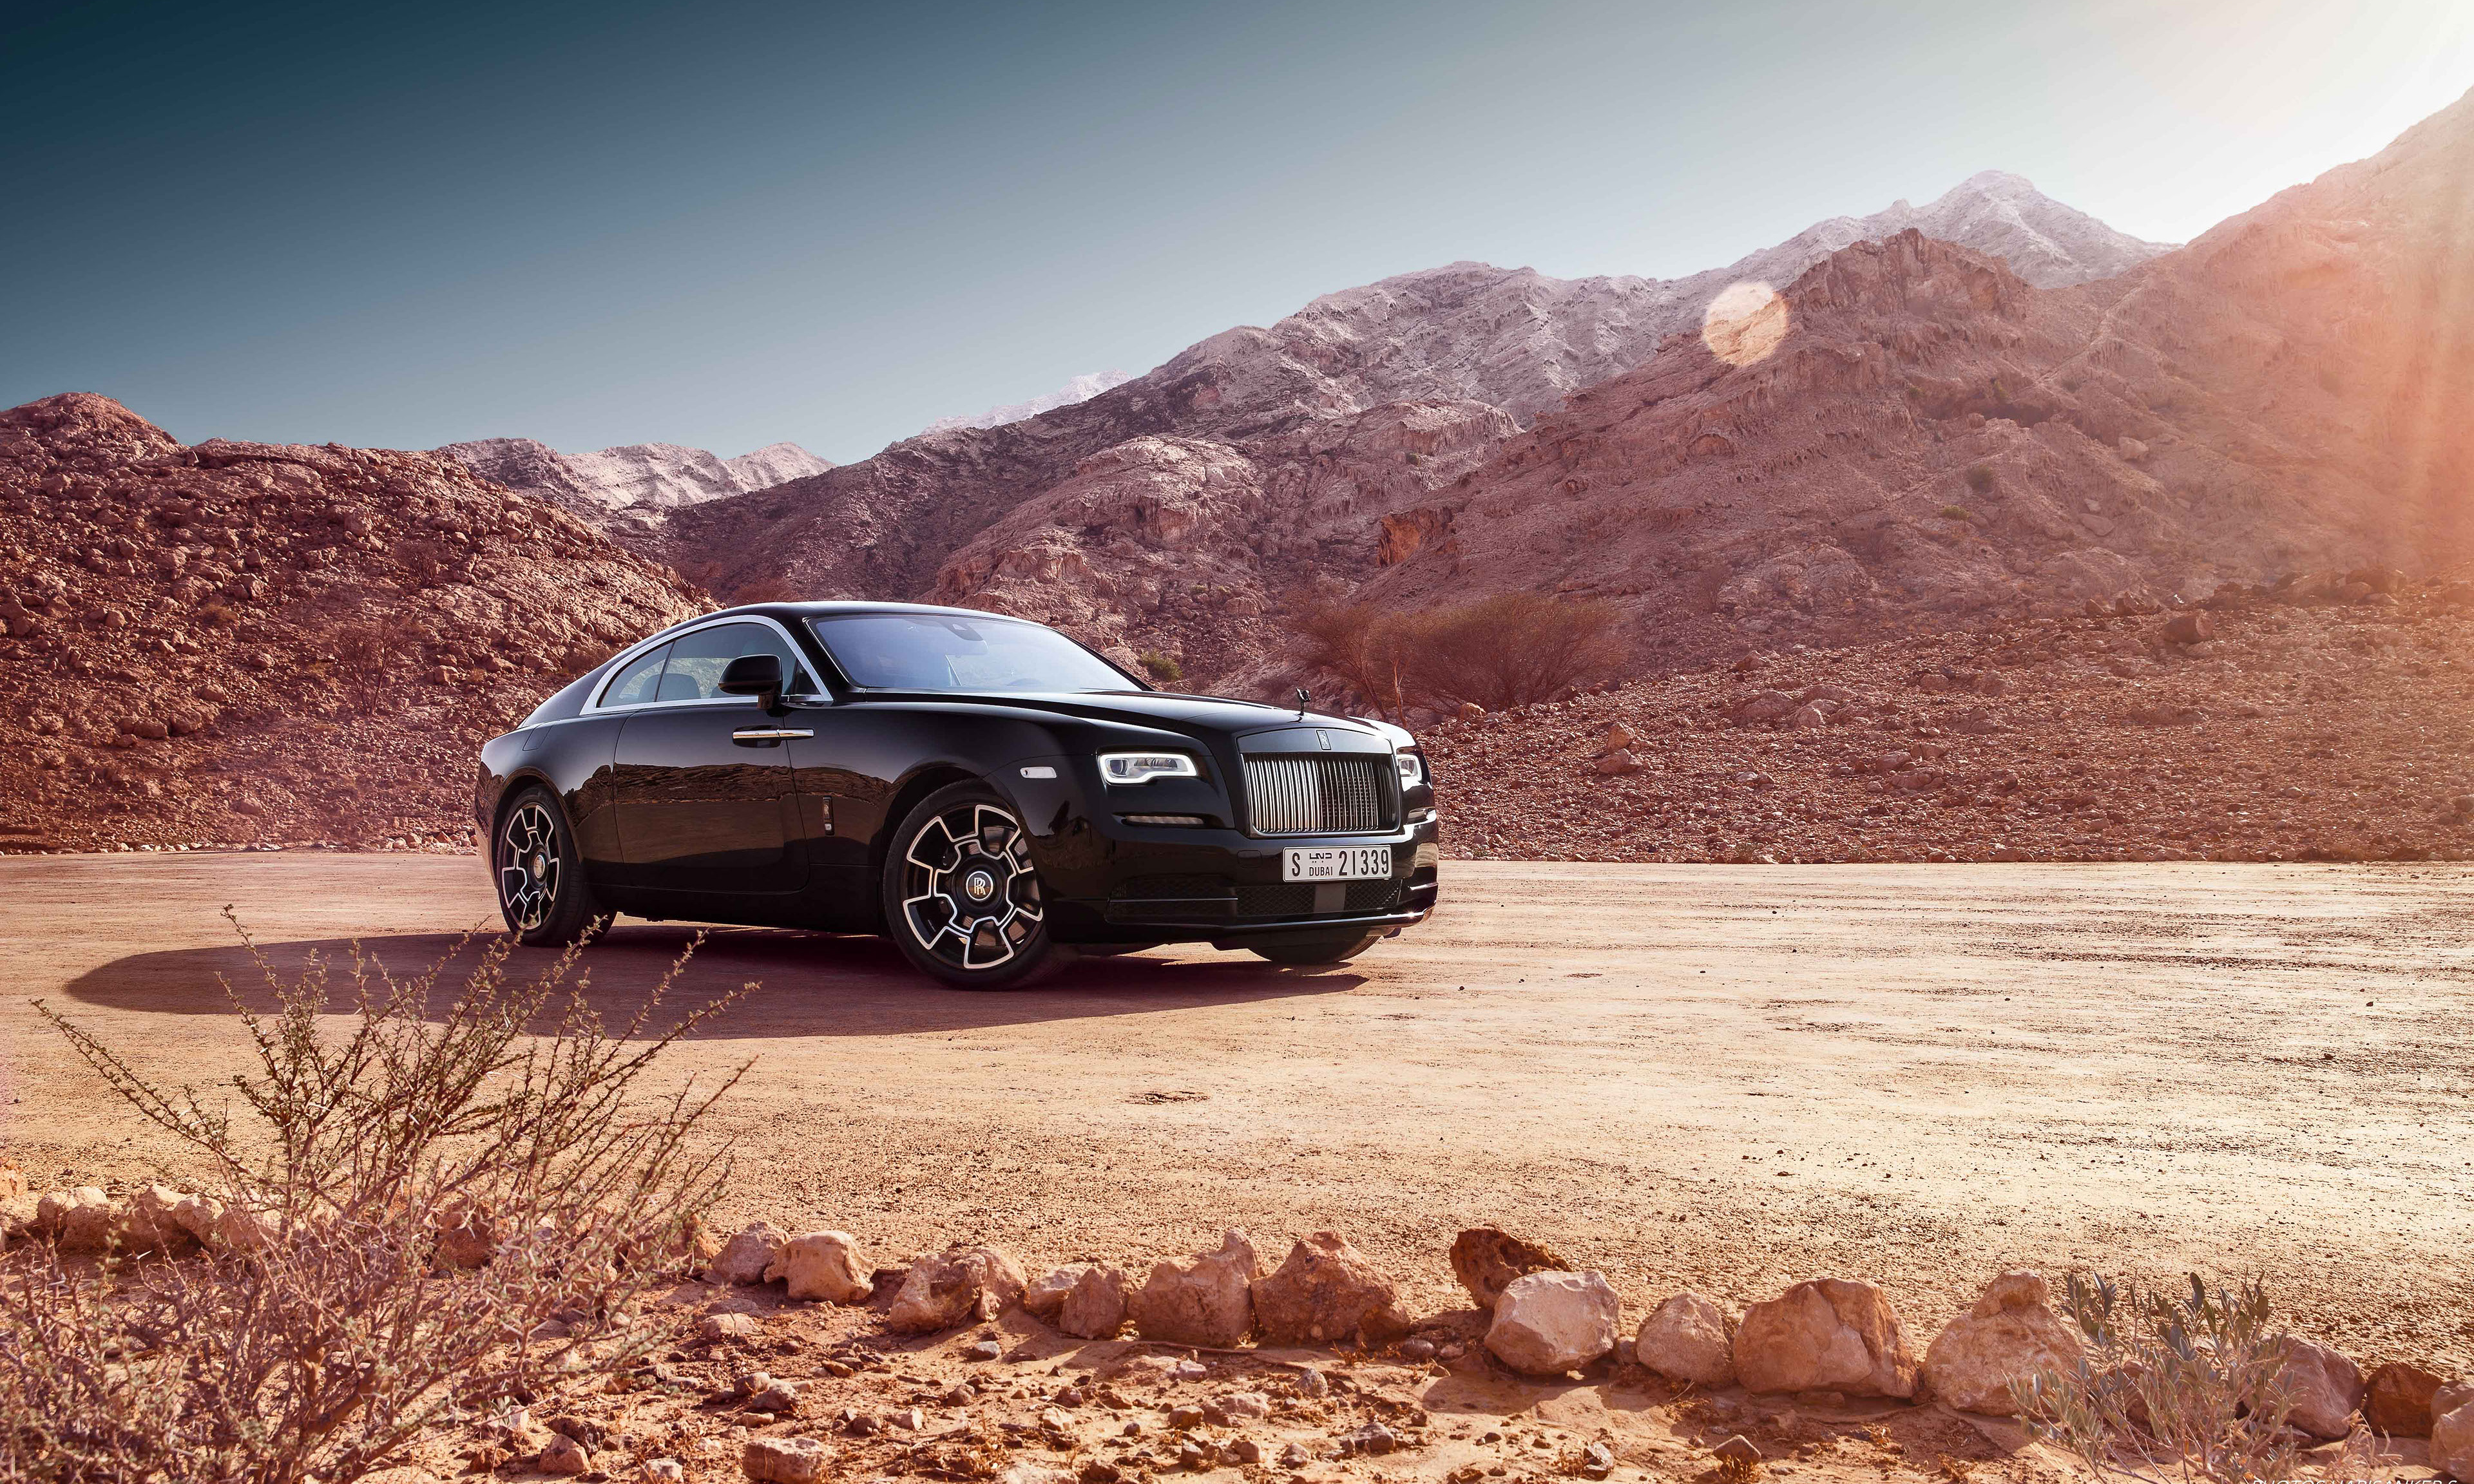 Rolls Royce Wraith Black Badge 4k Wallpaper Hd Car Wallpapers Id 11120